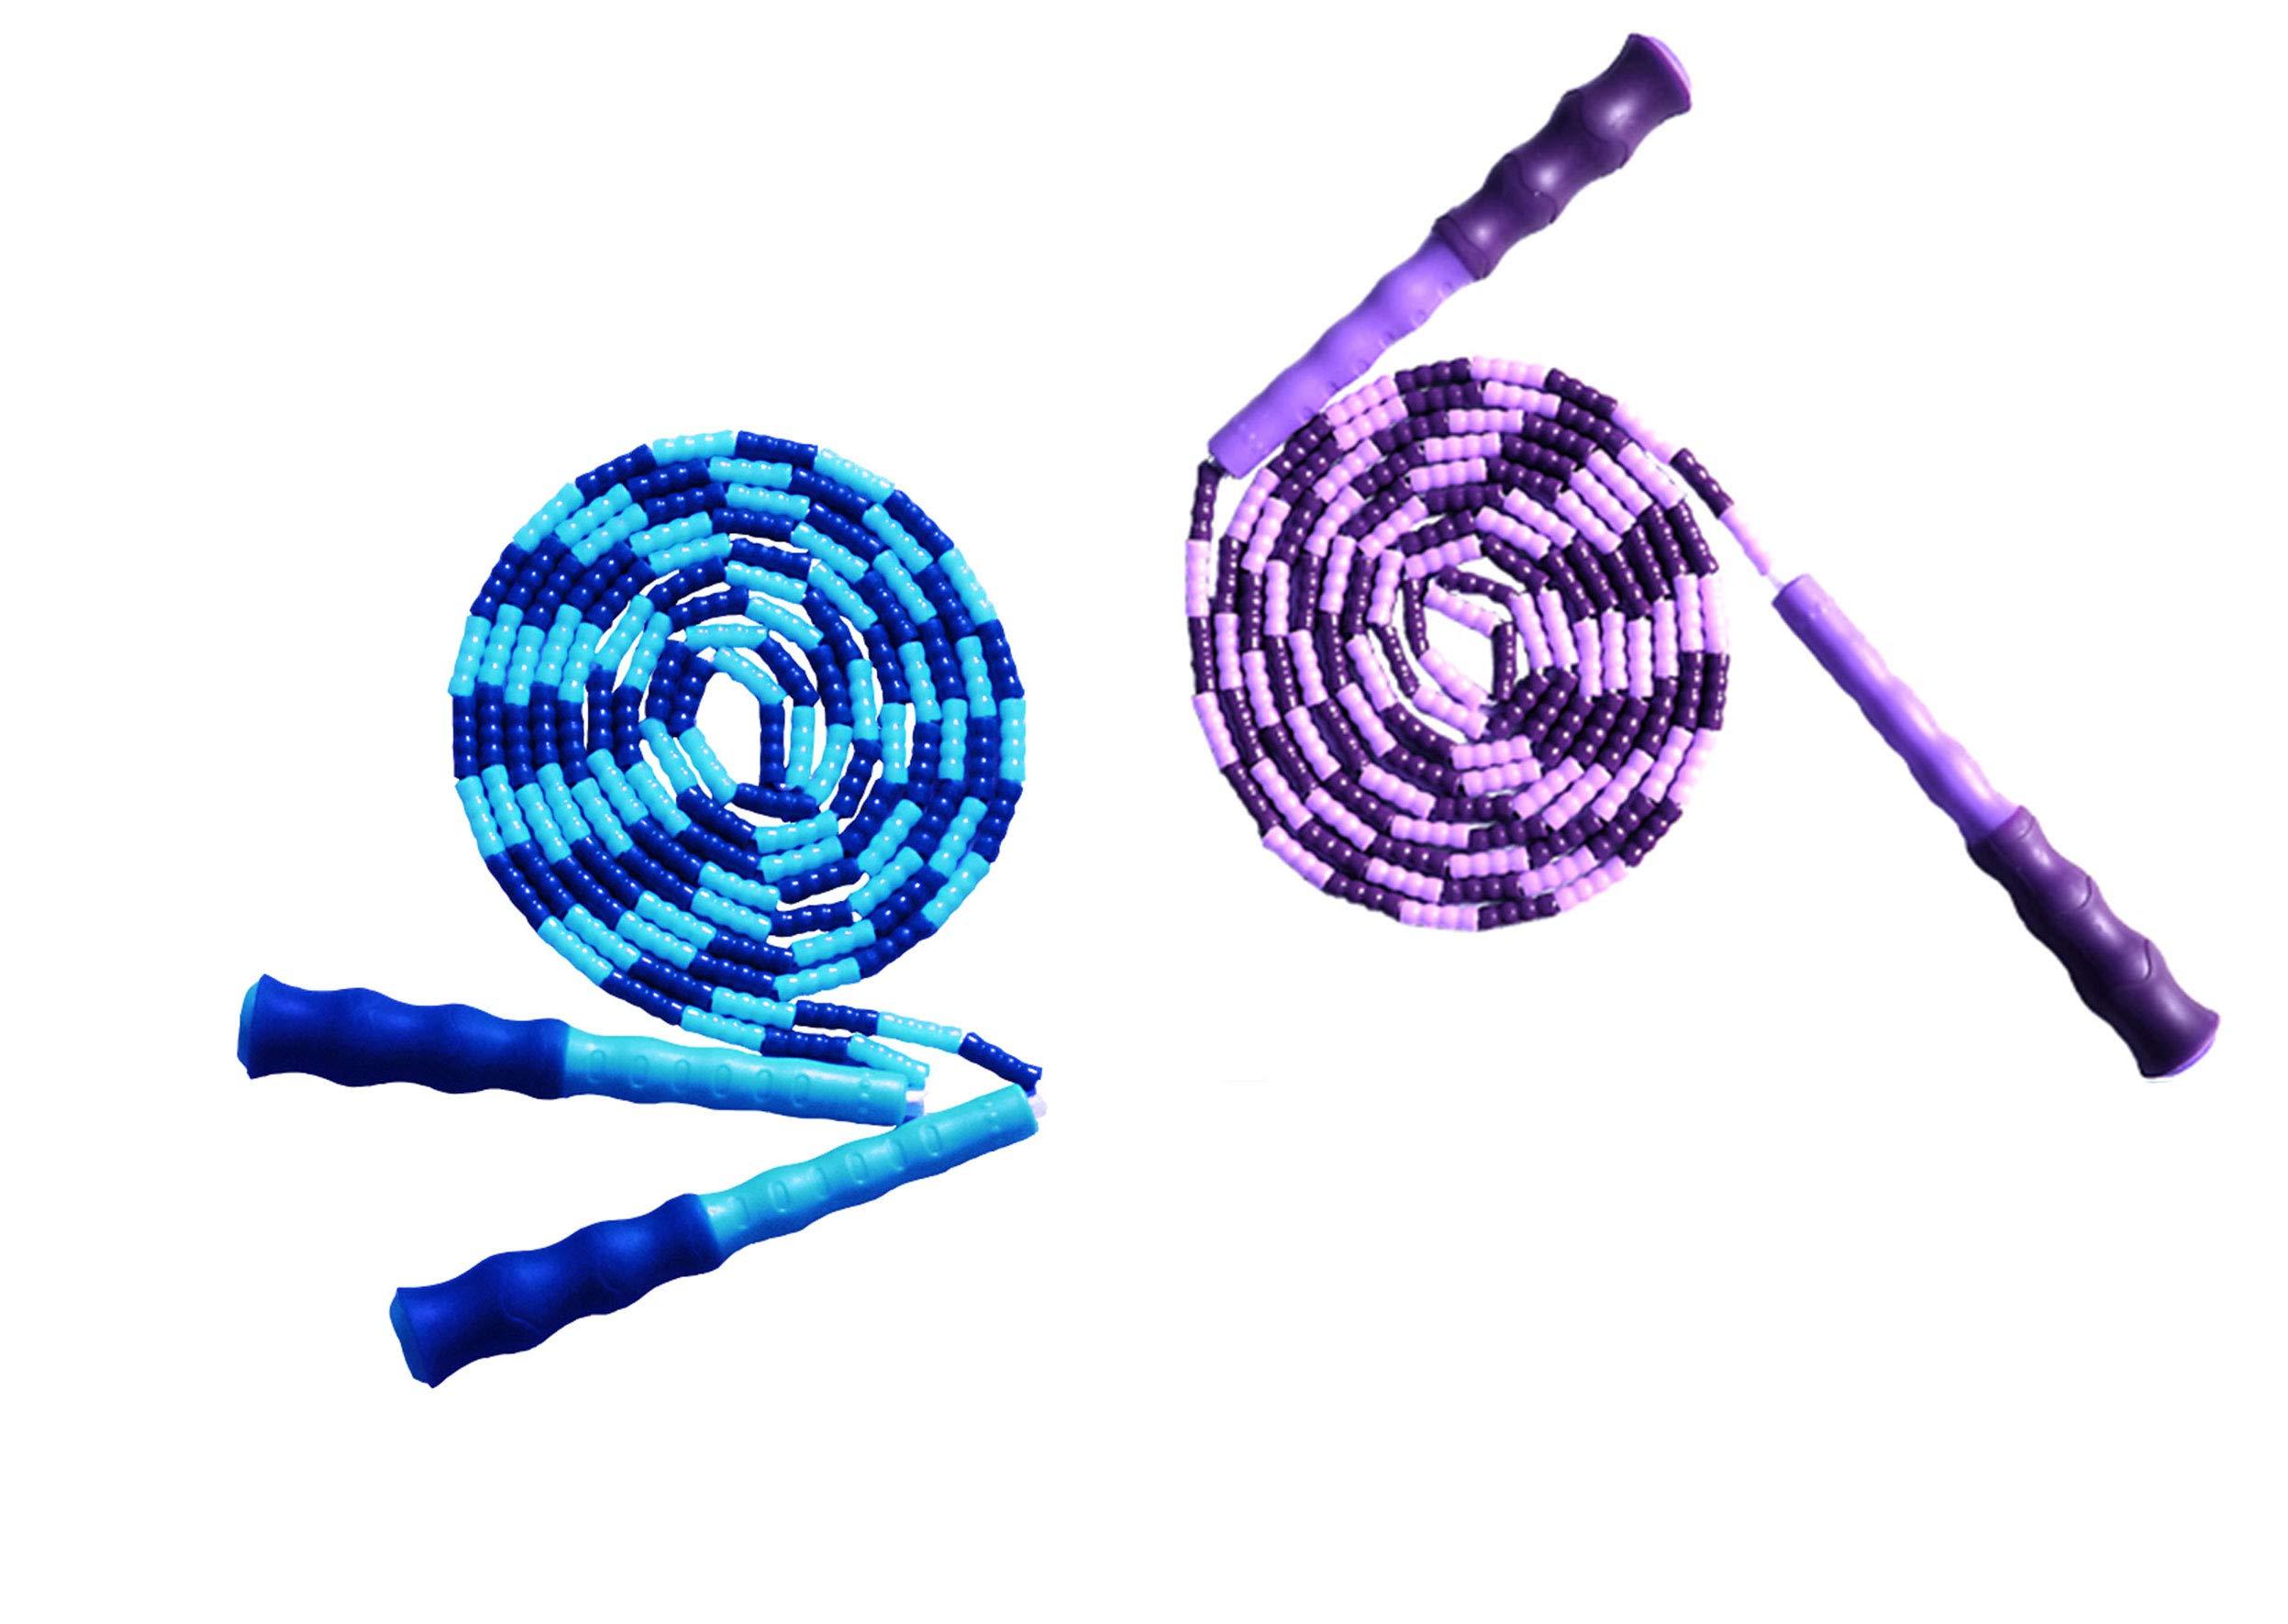 LETUSPORT 9 Feet Adjustable Beaded Segmented Jump Rope for Women Men Kids Lightweight Work Out Speeding Jumping Ropes (Blue+Purple, 2 pcs)